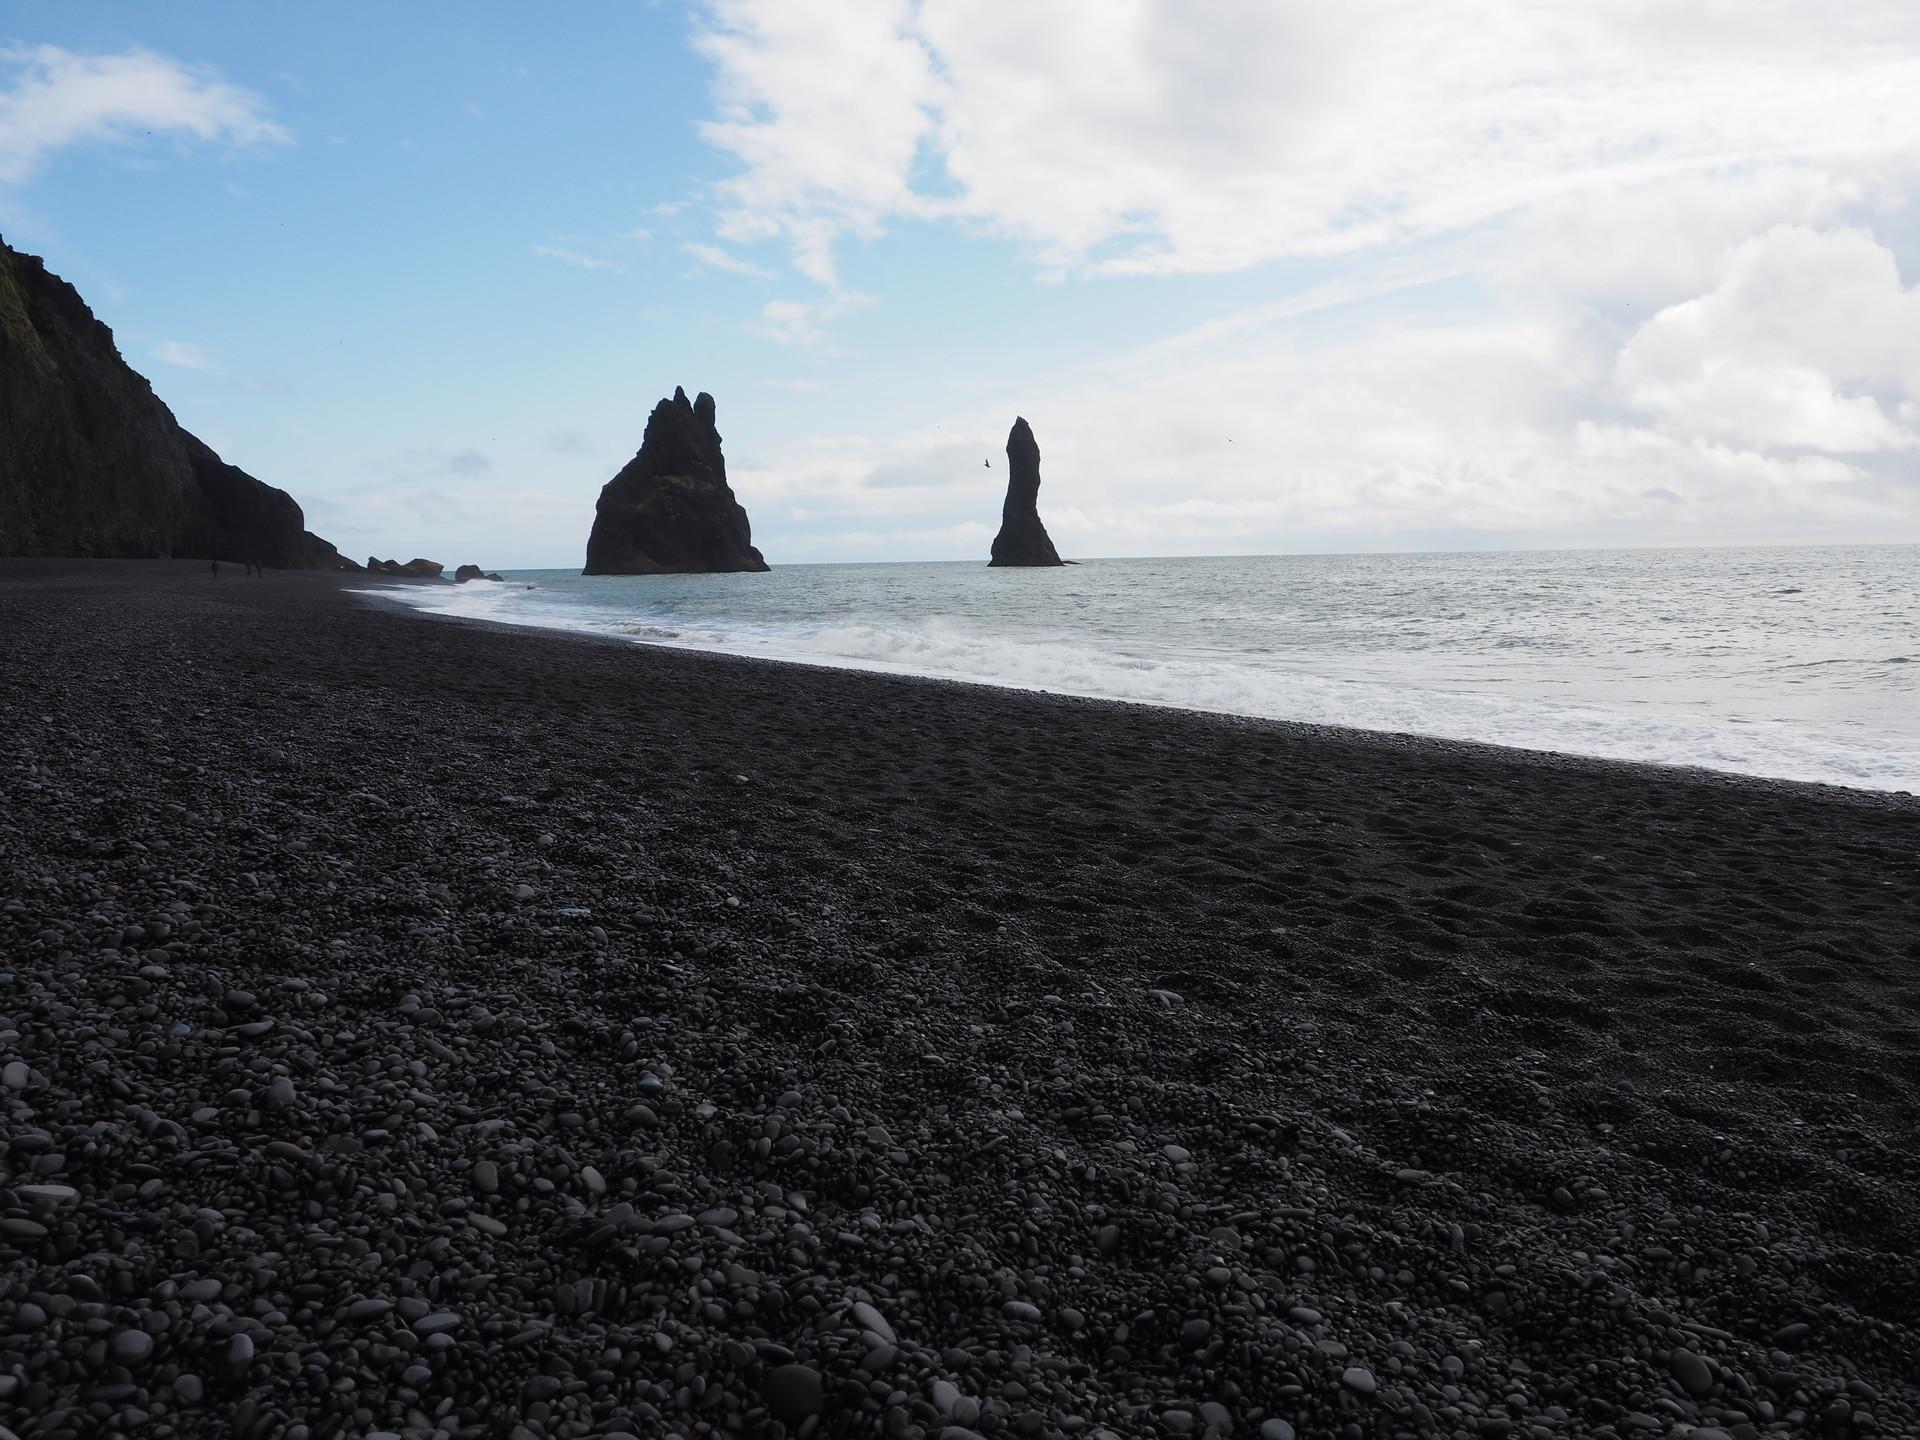 La spiaggia nera di Reynisfjara